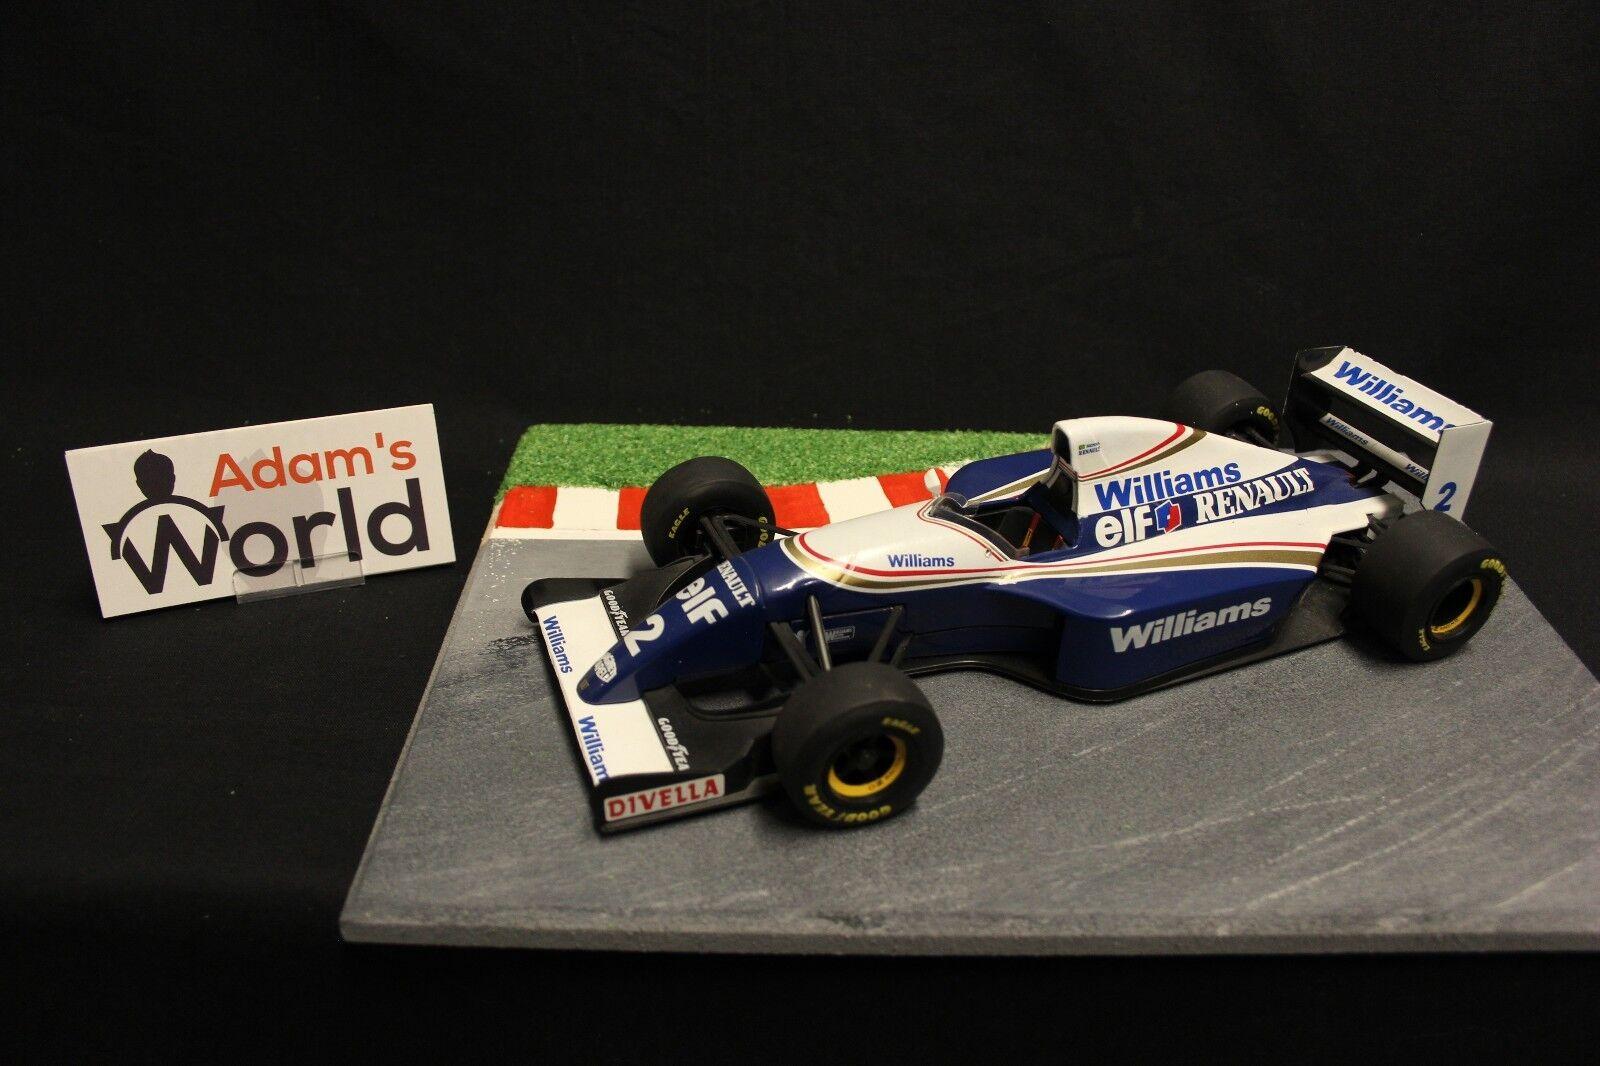 Minichamps Williams Renault show bil 1994 1 18 Ayrton Senna (BRA) (F1NB)